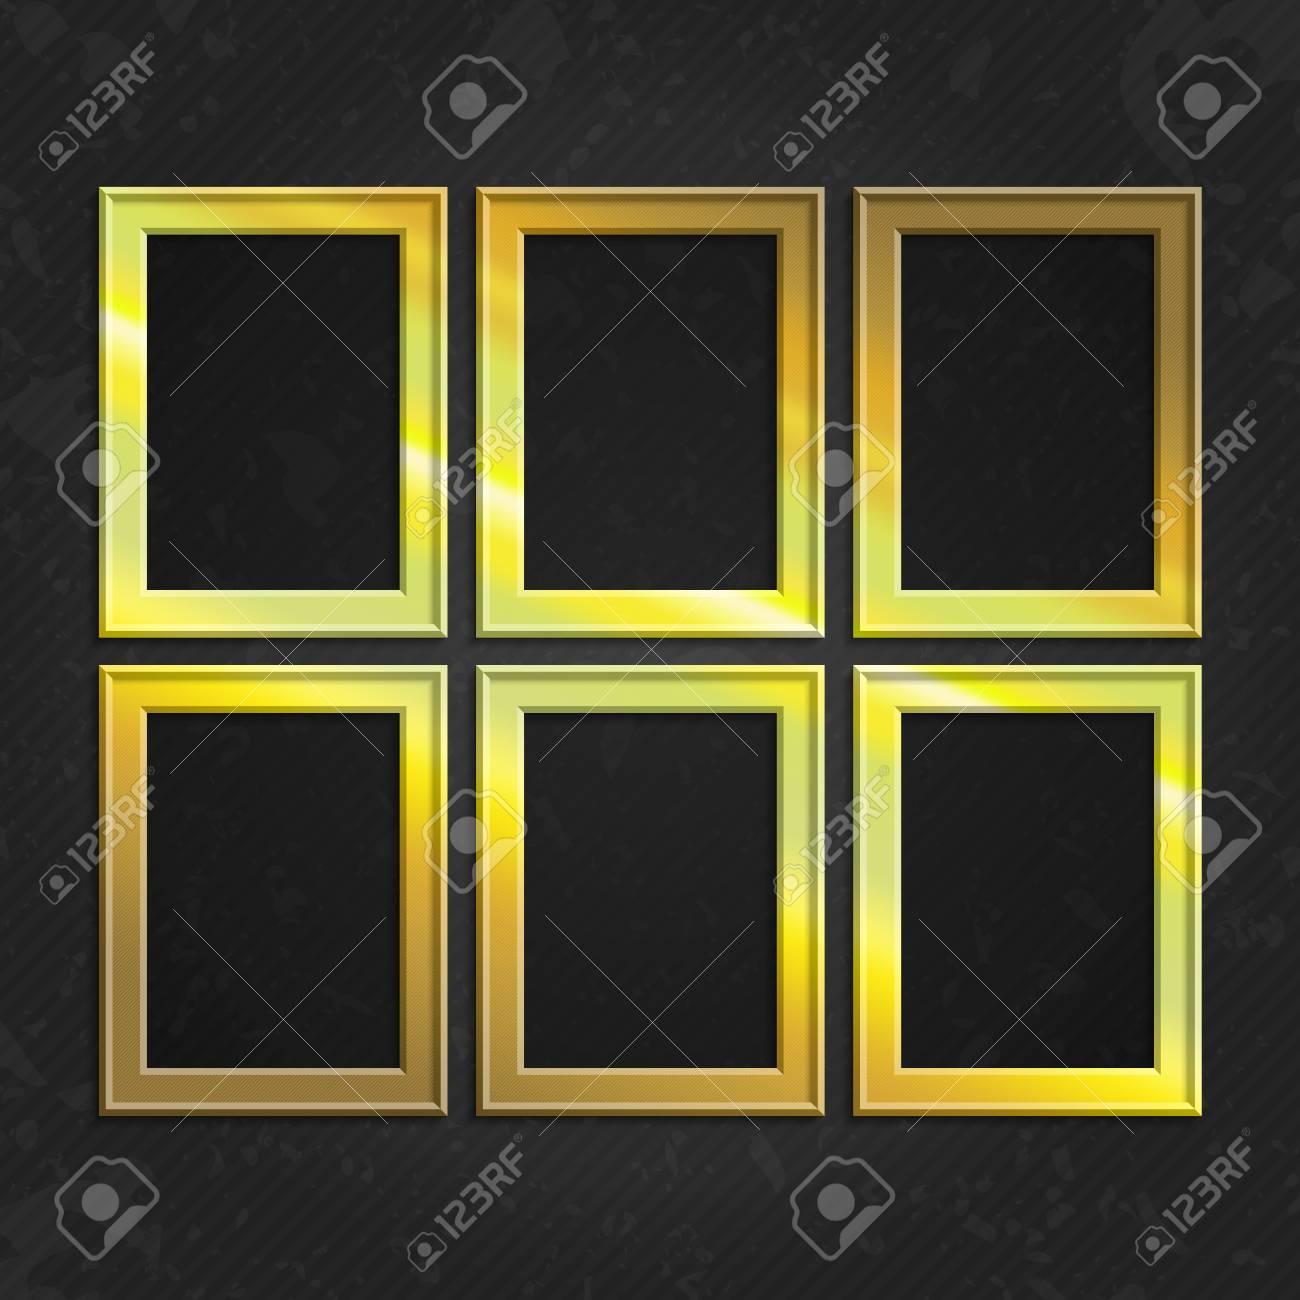 Set Of Gold Wooden Frames. Wooden Square Picture Frames Of Gold ...